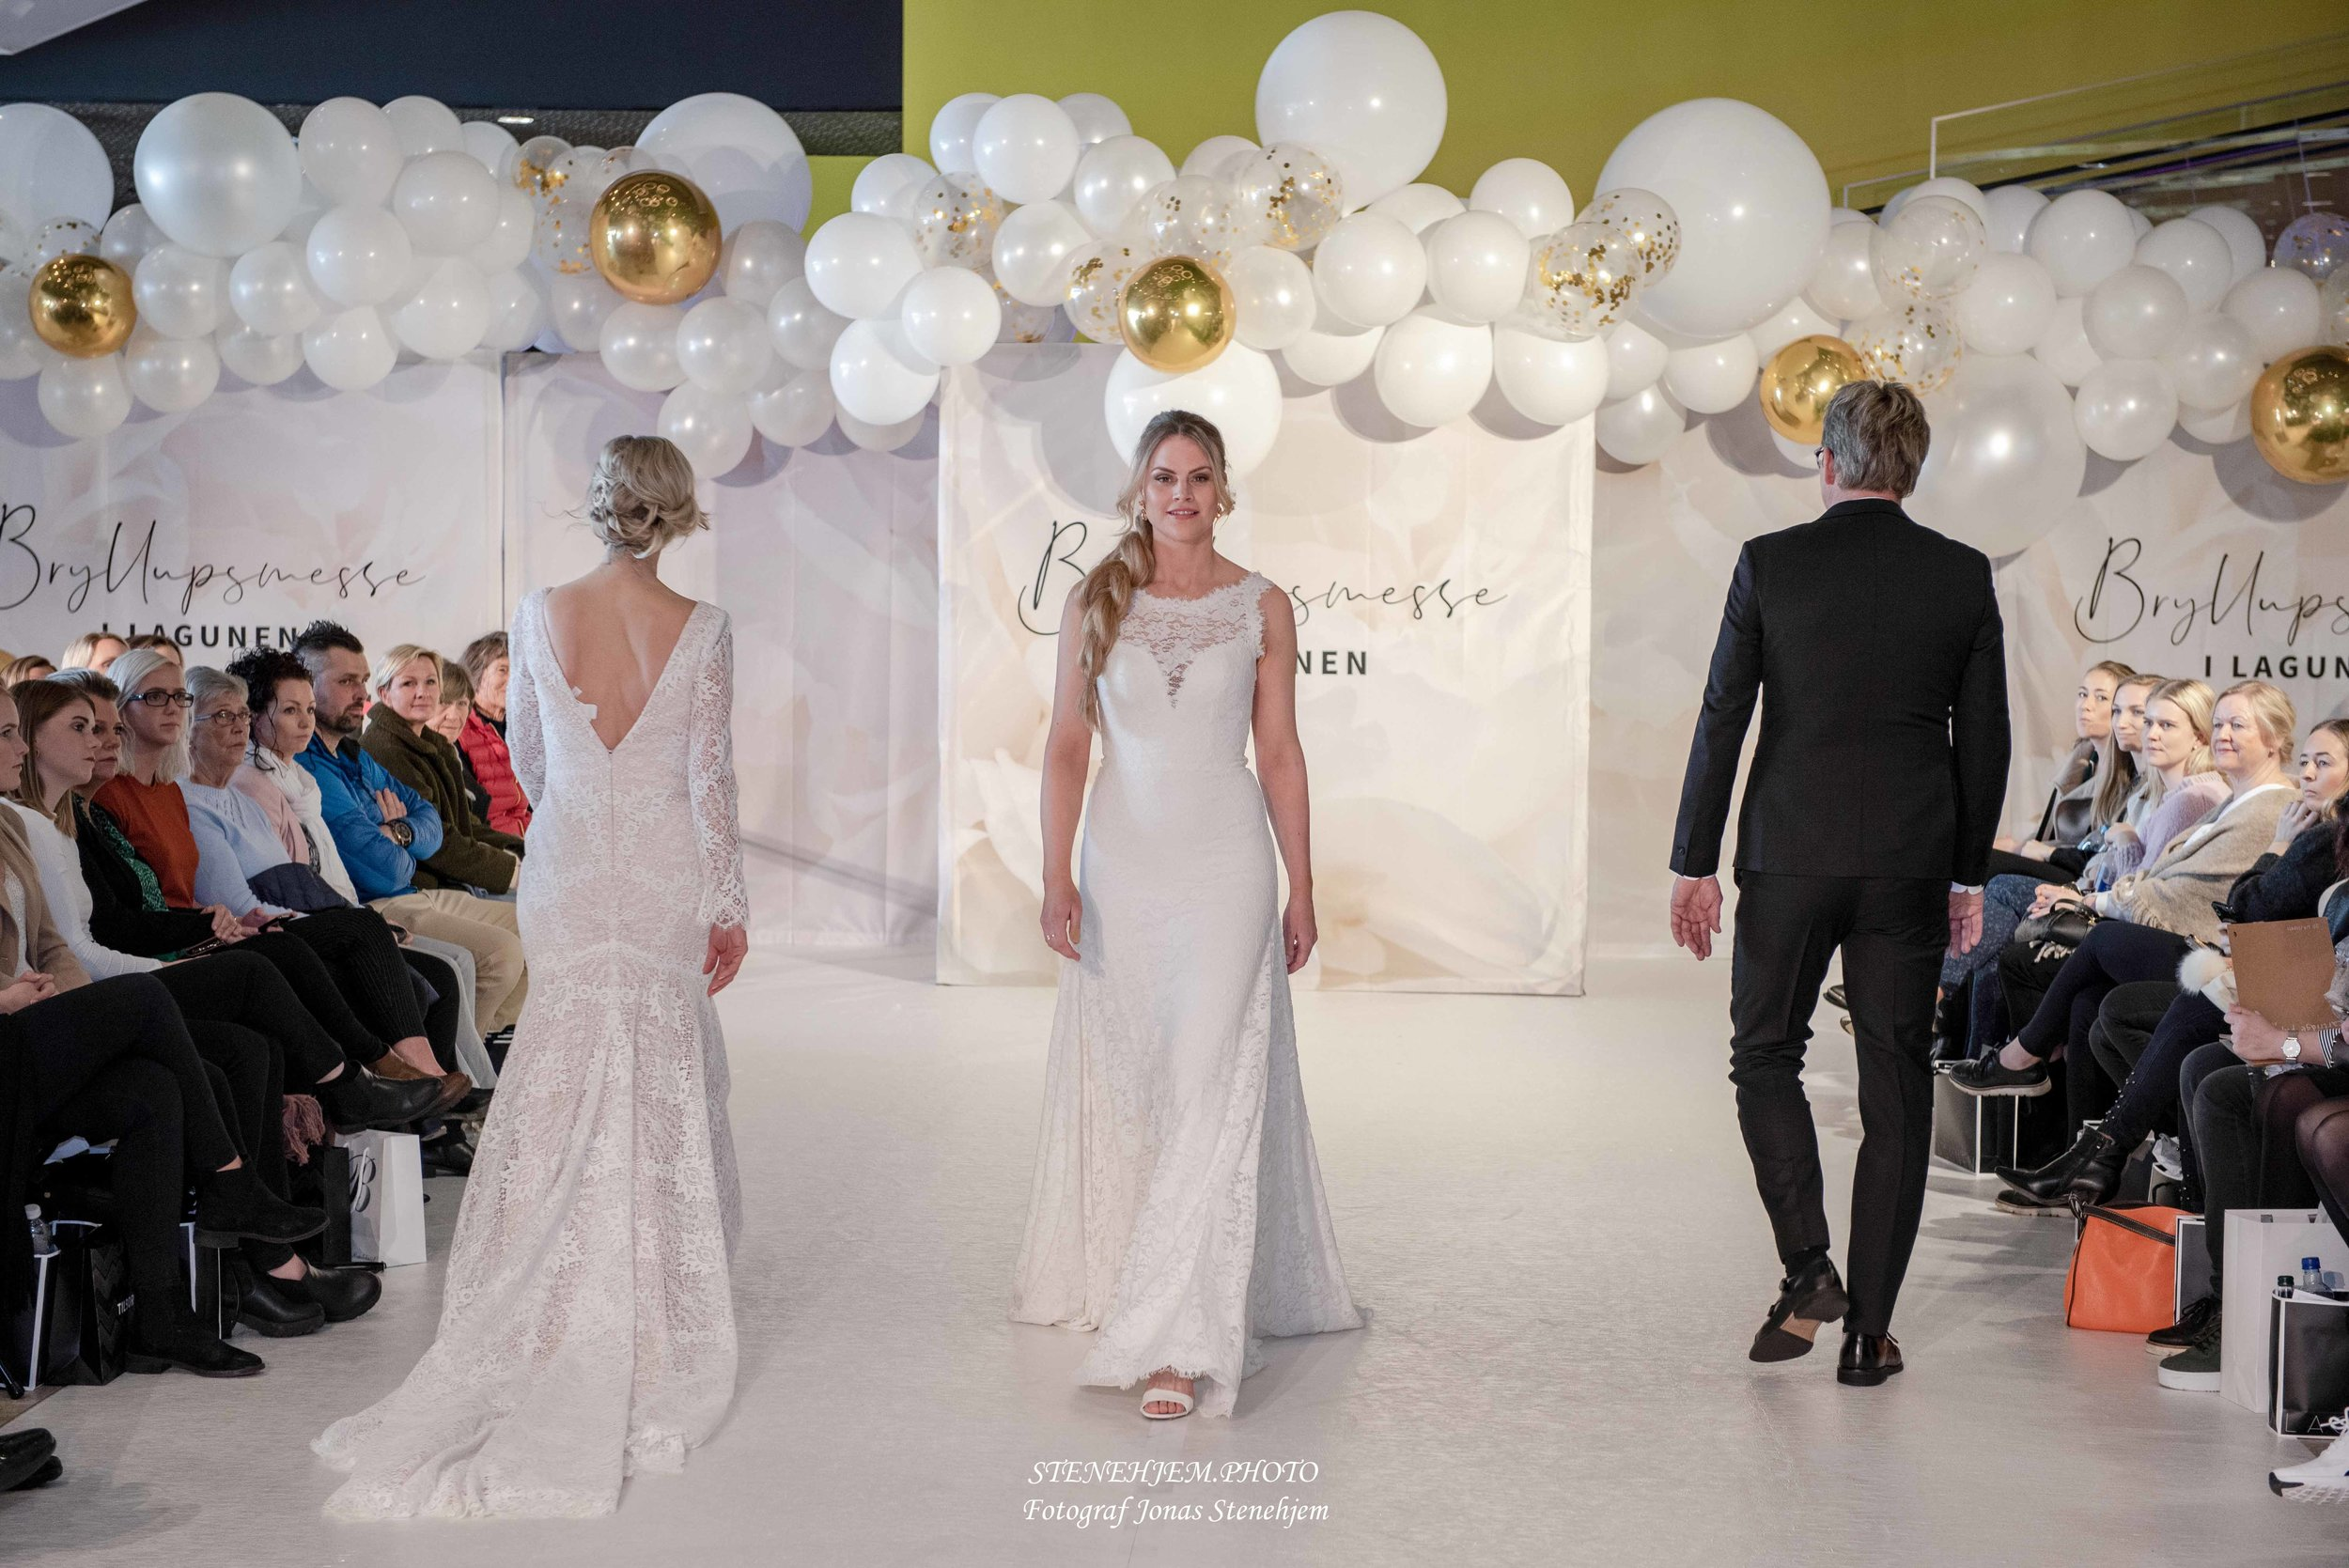 Bryllupsmesse_Lagunen_mittaltweddingfair__079.jpg